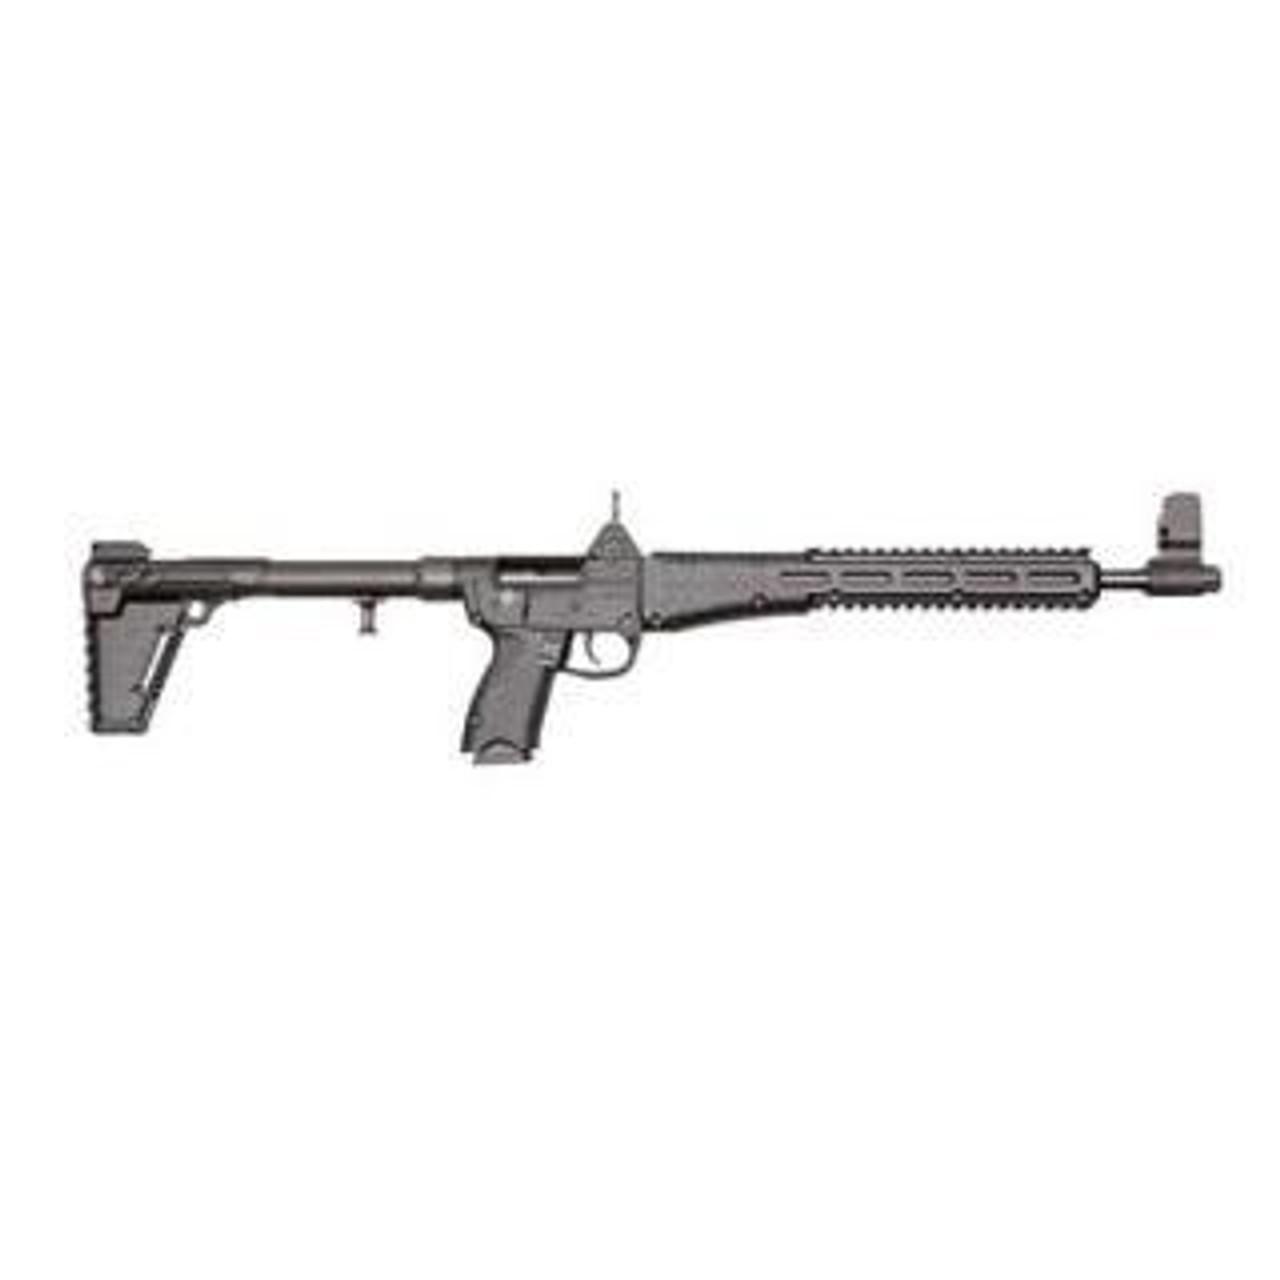 Kel Tec Sub2000 Gen 2(M&P40)- CALIFORNIA LEGAL - .40 S&W